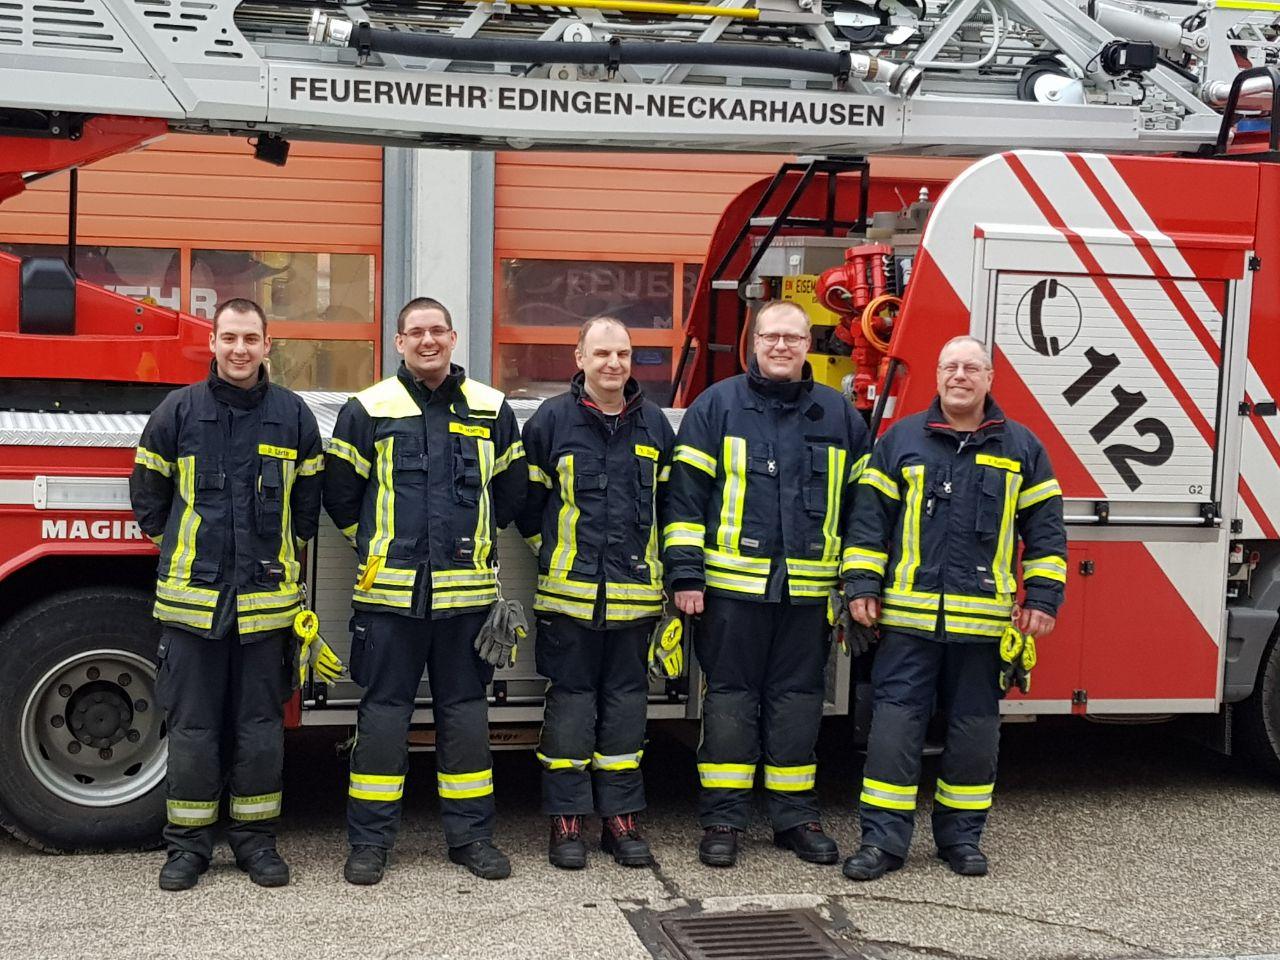 V.l.n.r.: Daniel Gärtner, Moritz Hoering, Thomas Quintel, Daniel Wolf und Ausbilder Volker Rausch